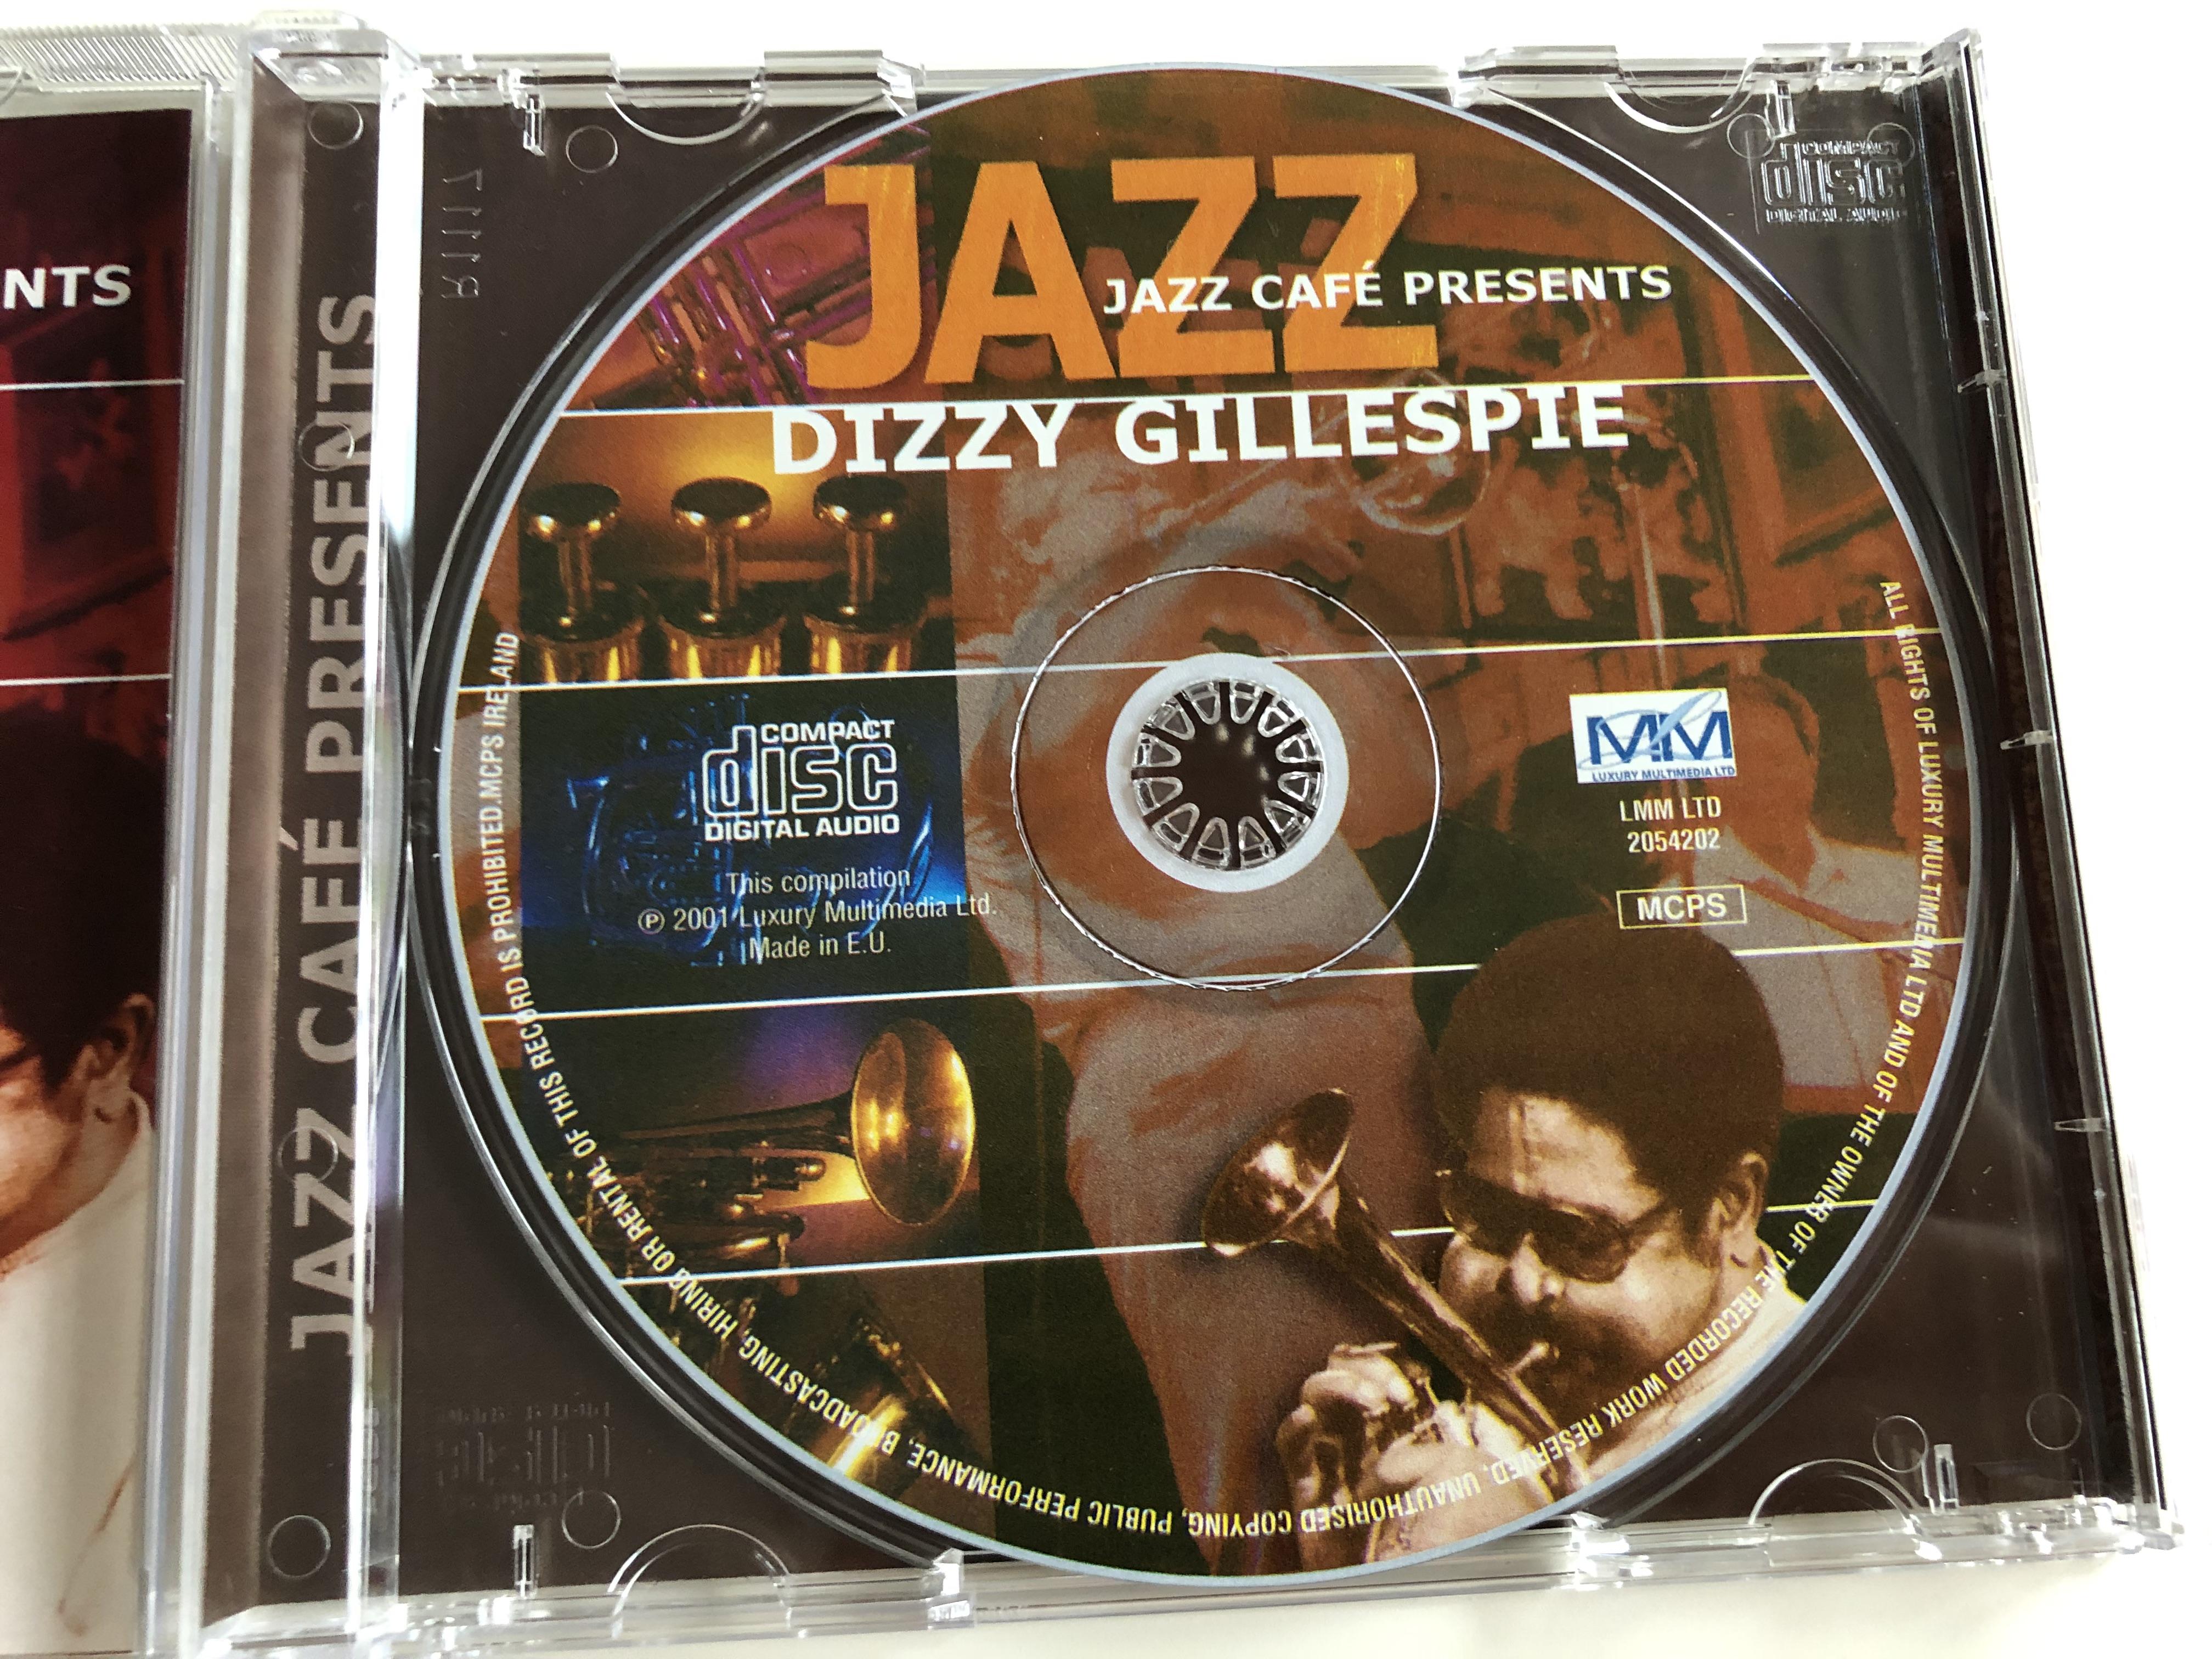 jazz-caf-presents-dizzy-gillespie-audio-cd-2001-galaxy-music-3899202-2-.jpg